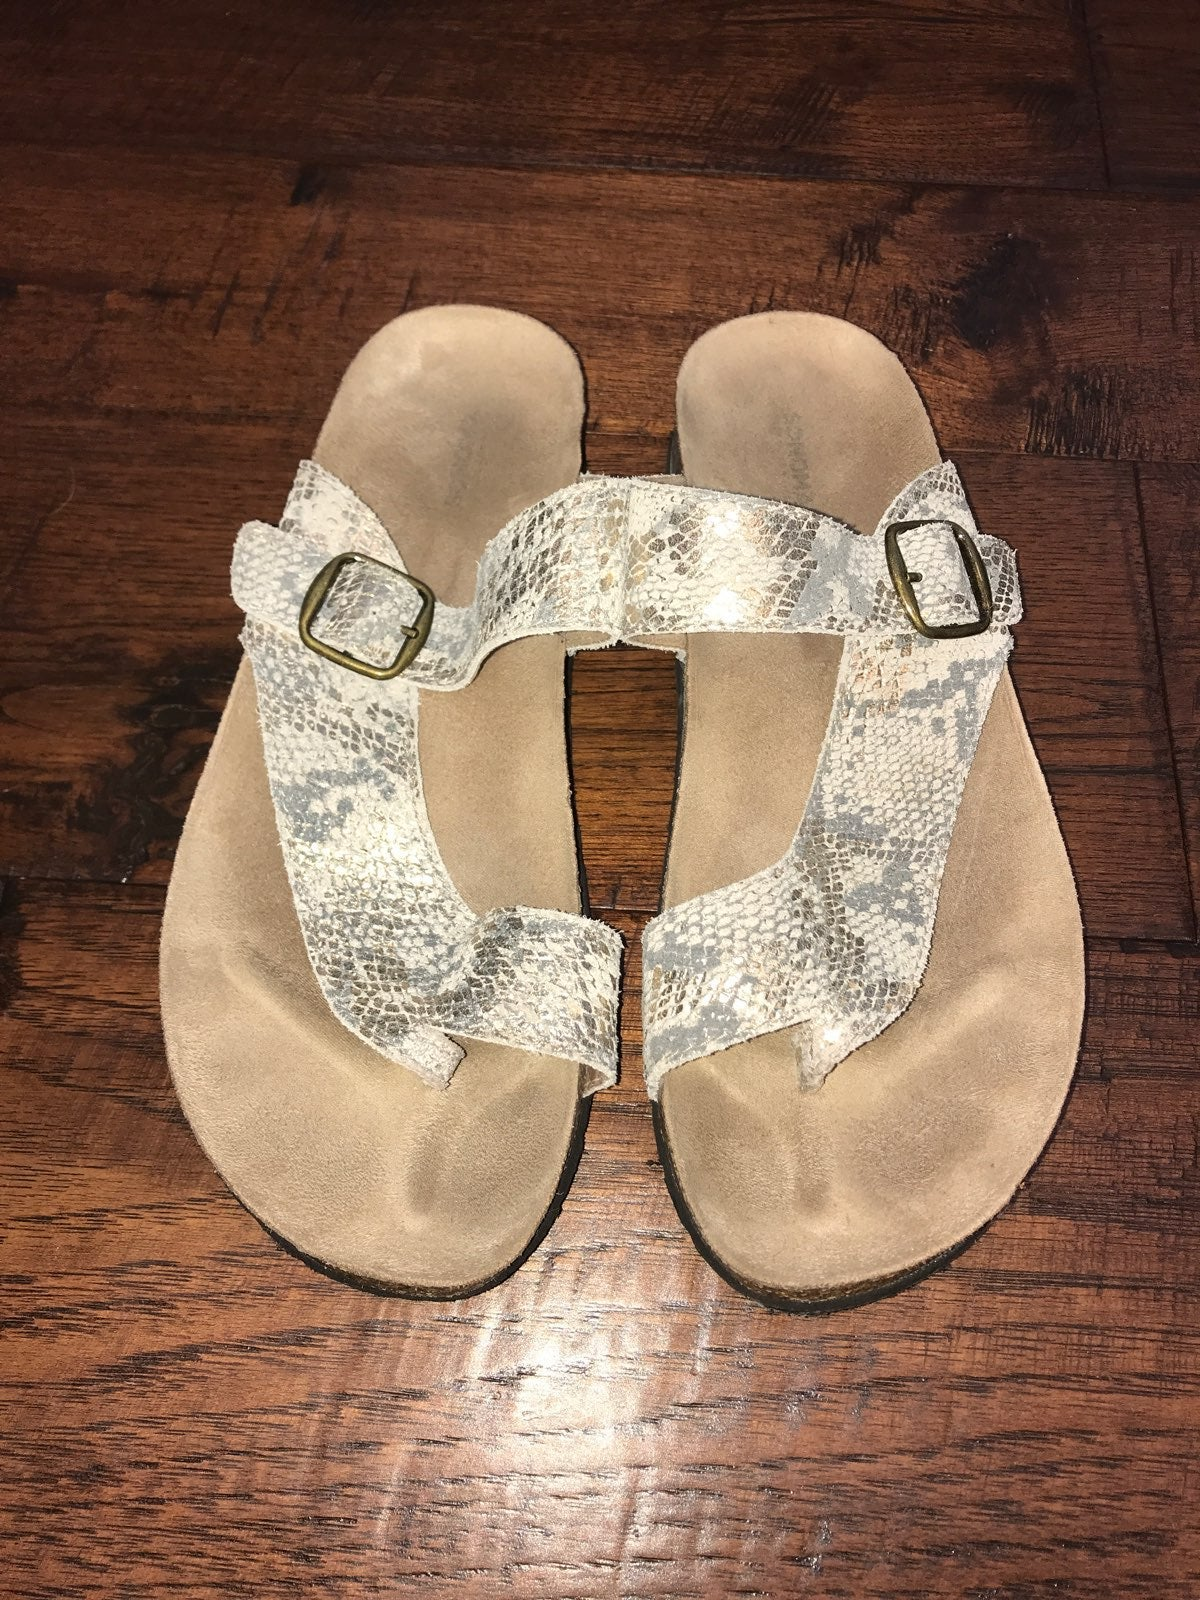 Sonoma Birkenstock Sandals Size 9